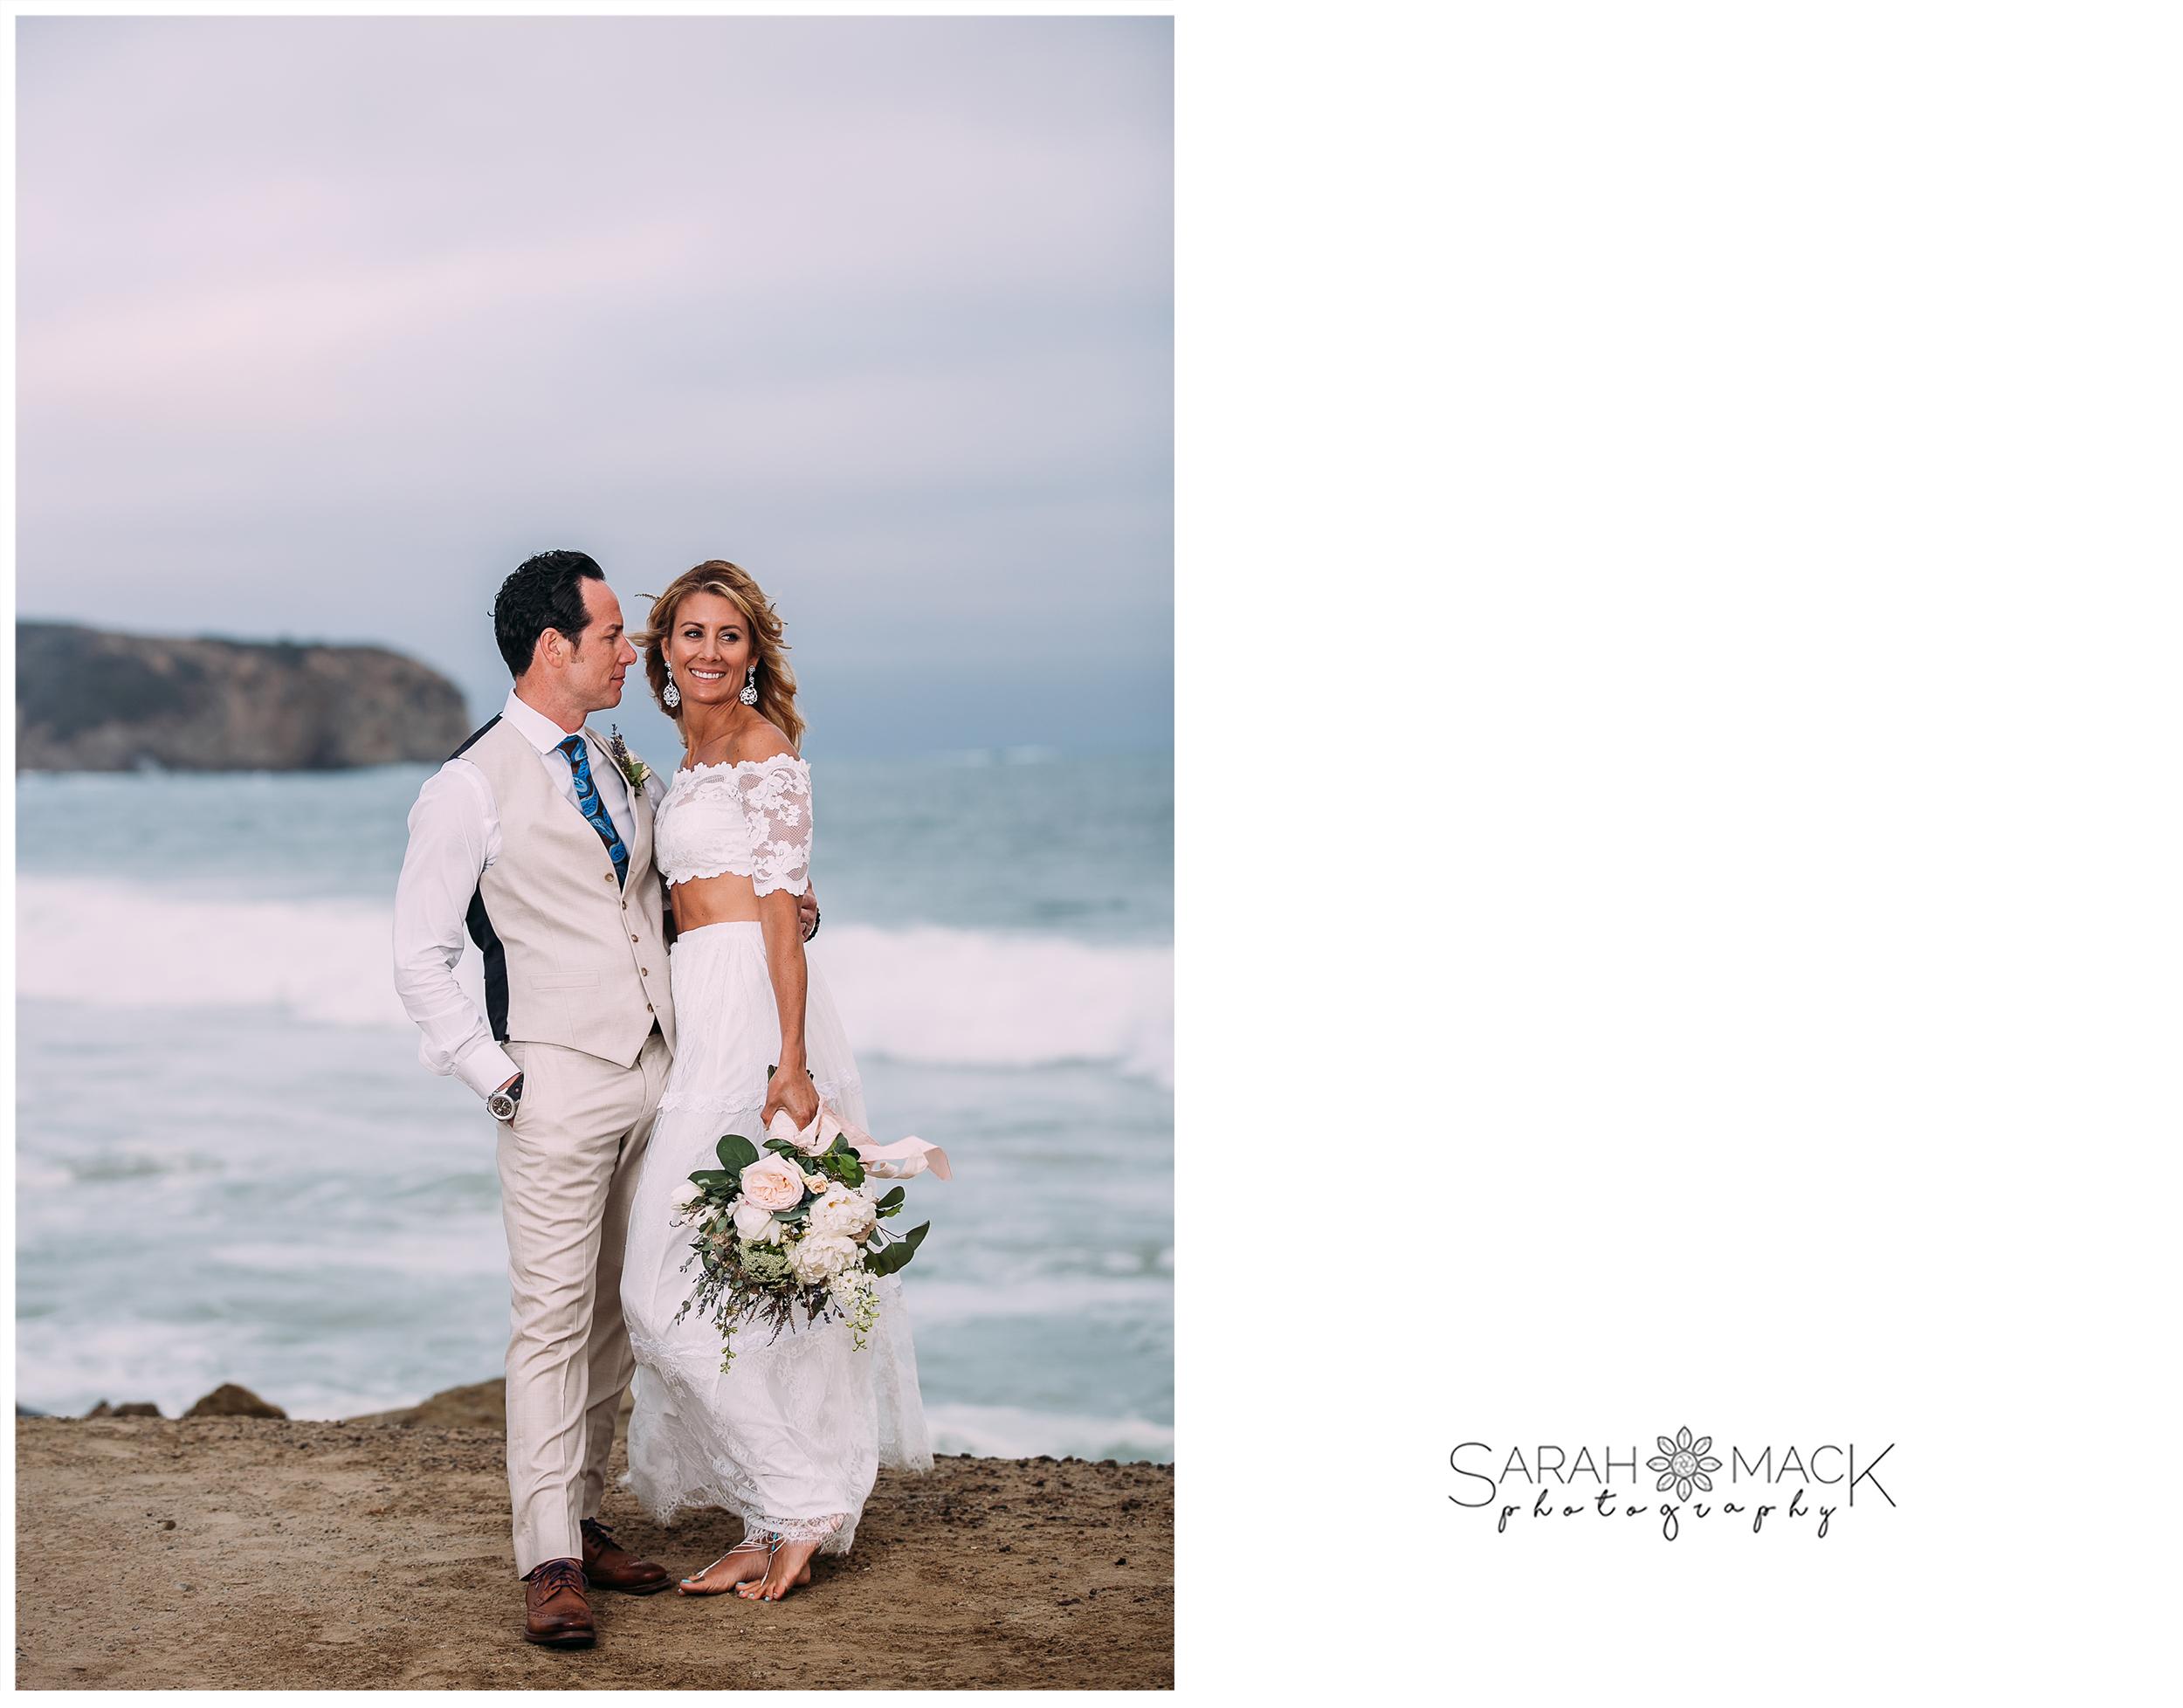 TD-Ritz-Carlton-Laguna-Niguel-Wedding-Photography-25.jpg